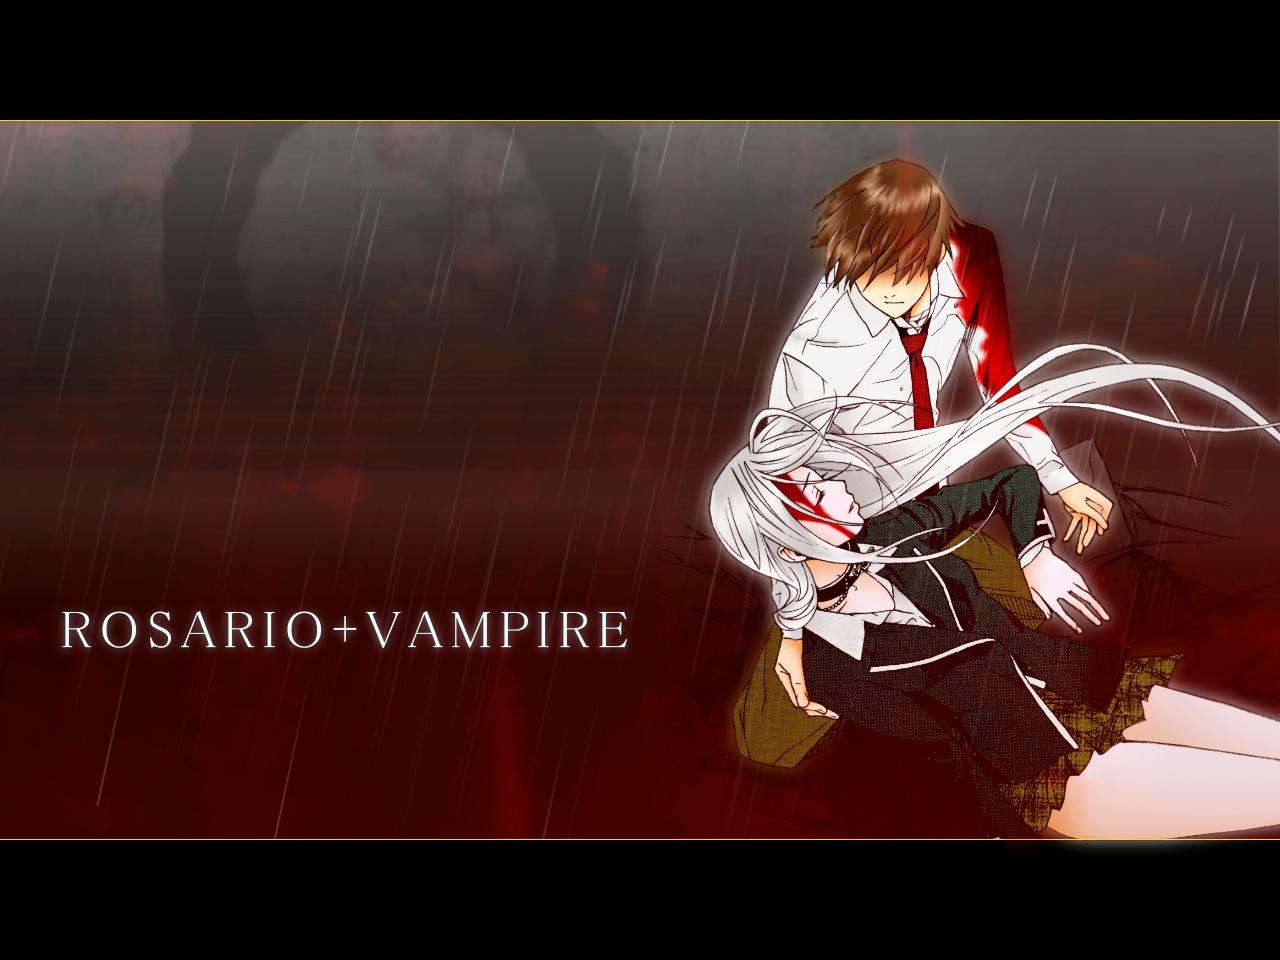 Rosario vampire season 3 release date